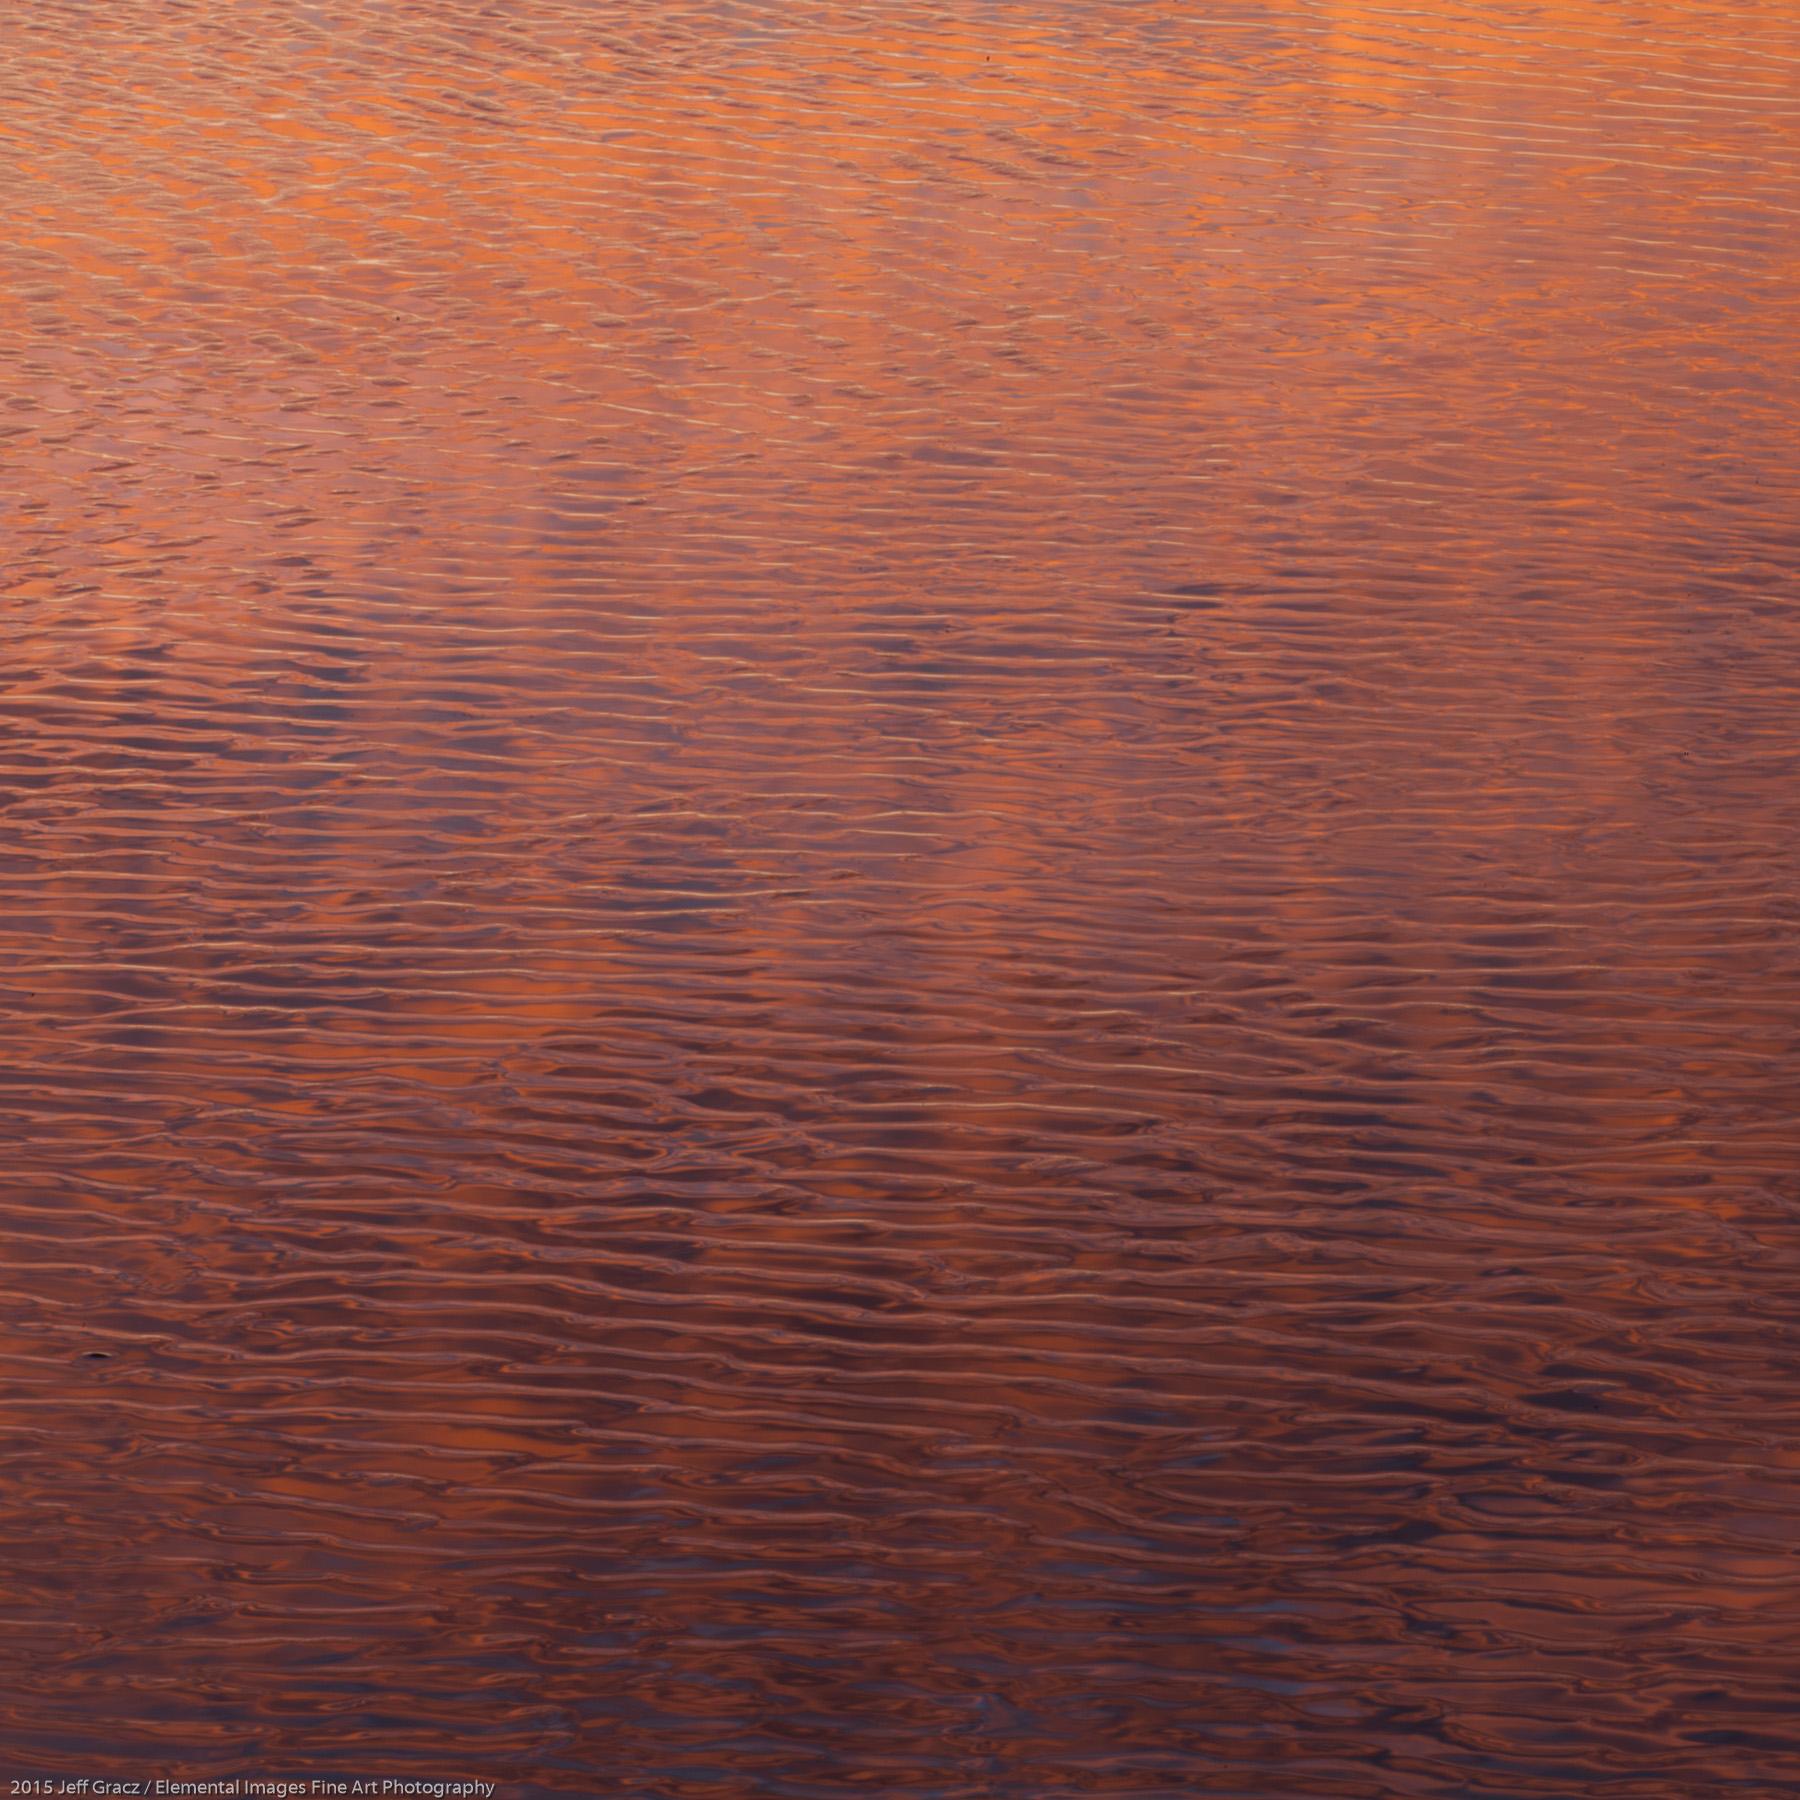 Water Reflections XV | Long Beach | WA | USA - © 2015 Jeff Gracz / Elemental Images Fine Art Photography - All Rights Reserved Worldwide